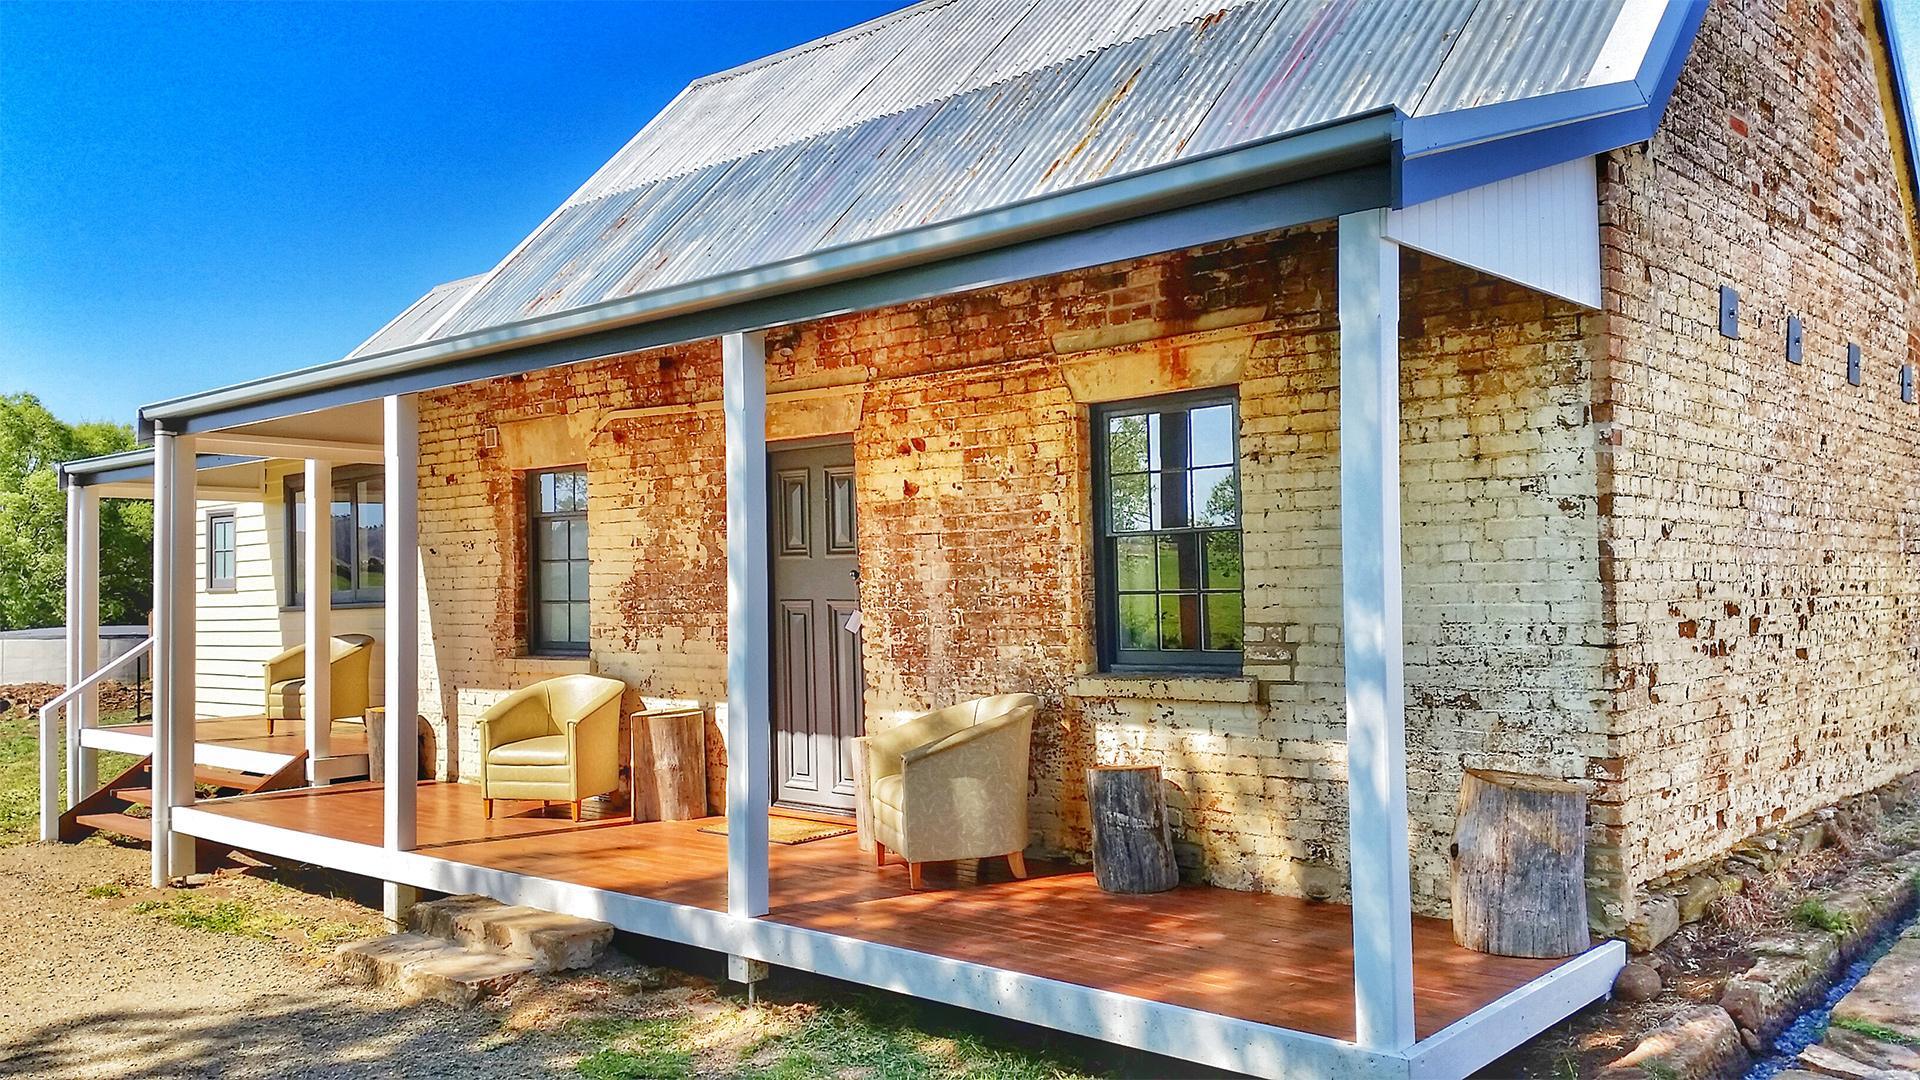 Premium Two-Bedroom Cottage image 1 at Ratho Farm by Central Highlands Council, Tasmania, Australia